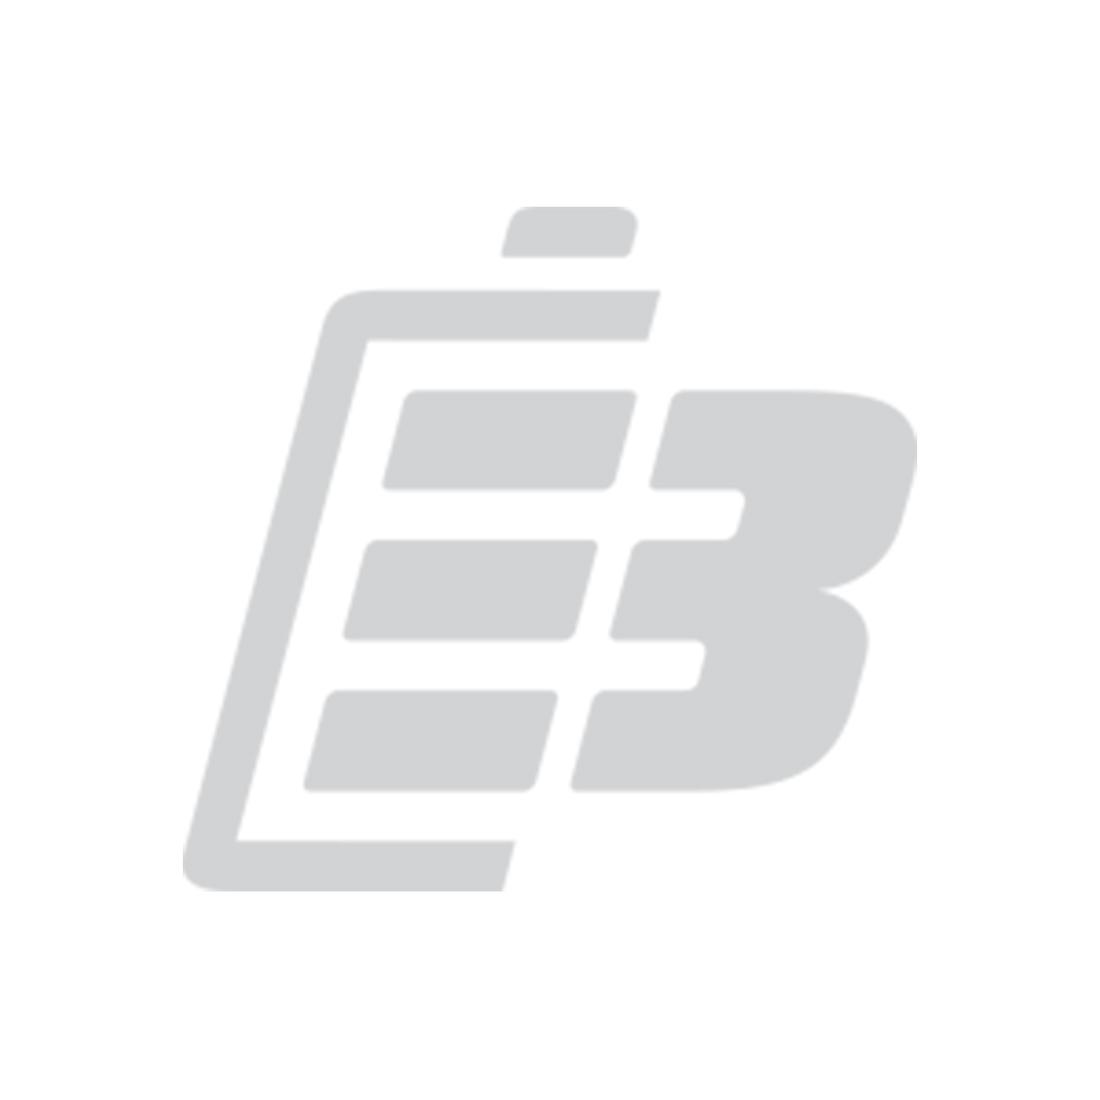 Netbook battery Compaq 311c_1